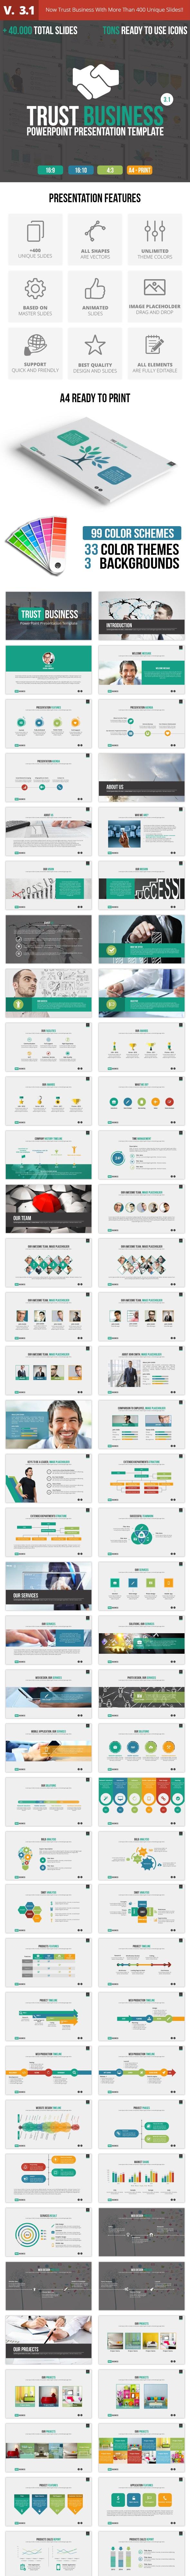 Trust Business PowerPoint Presentation Template - Business PowerPoint Templates